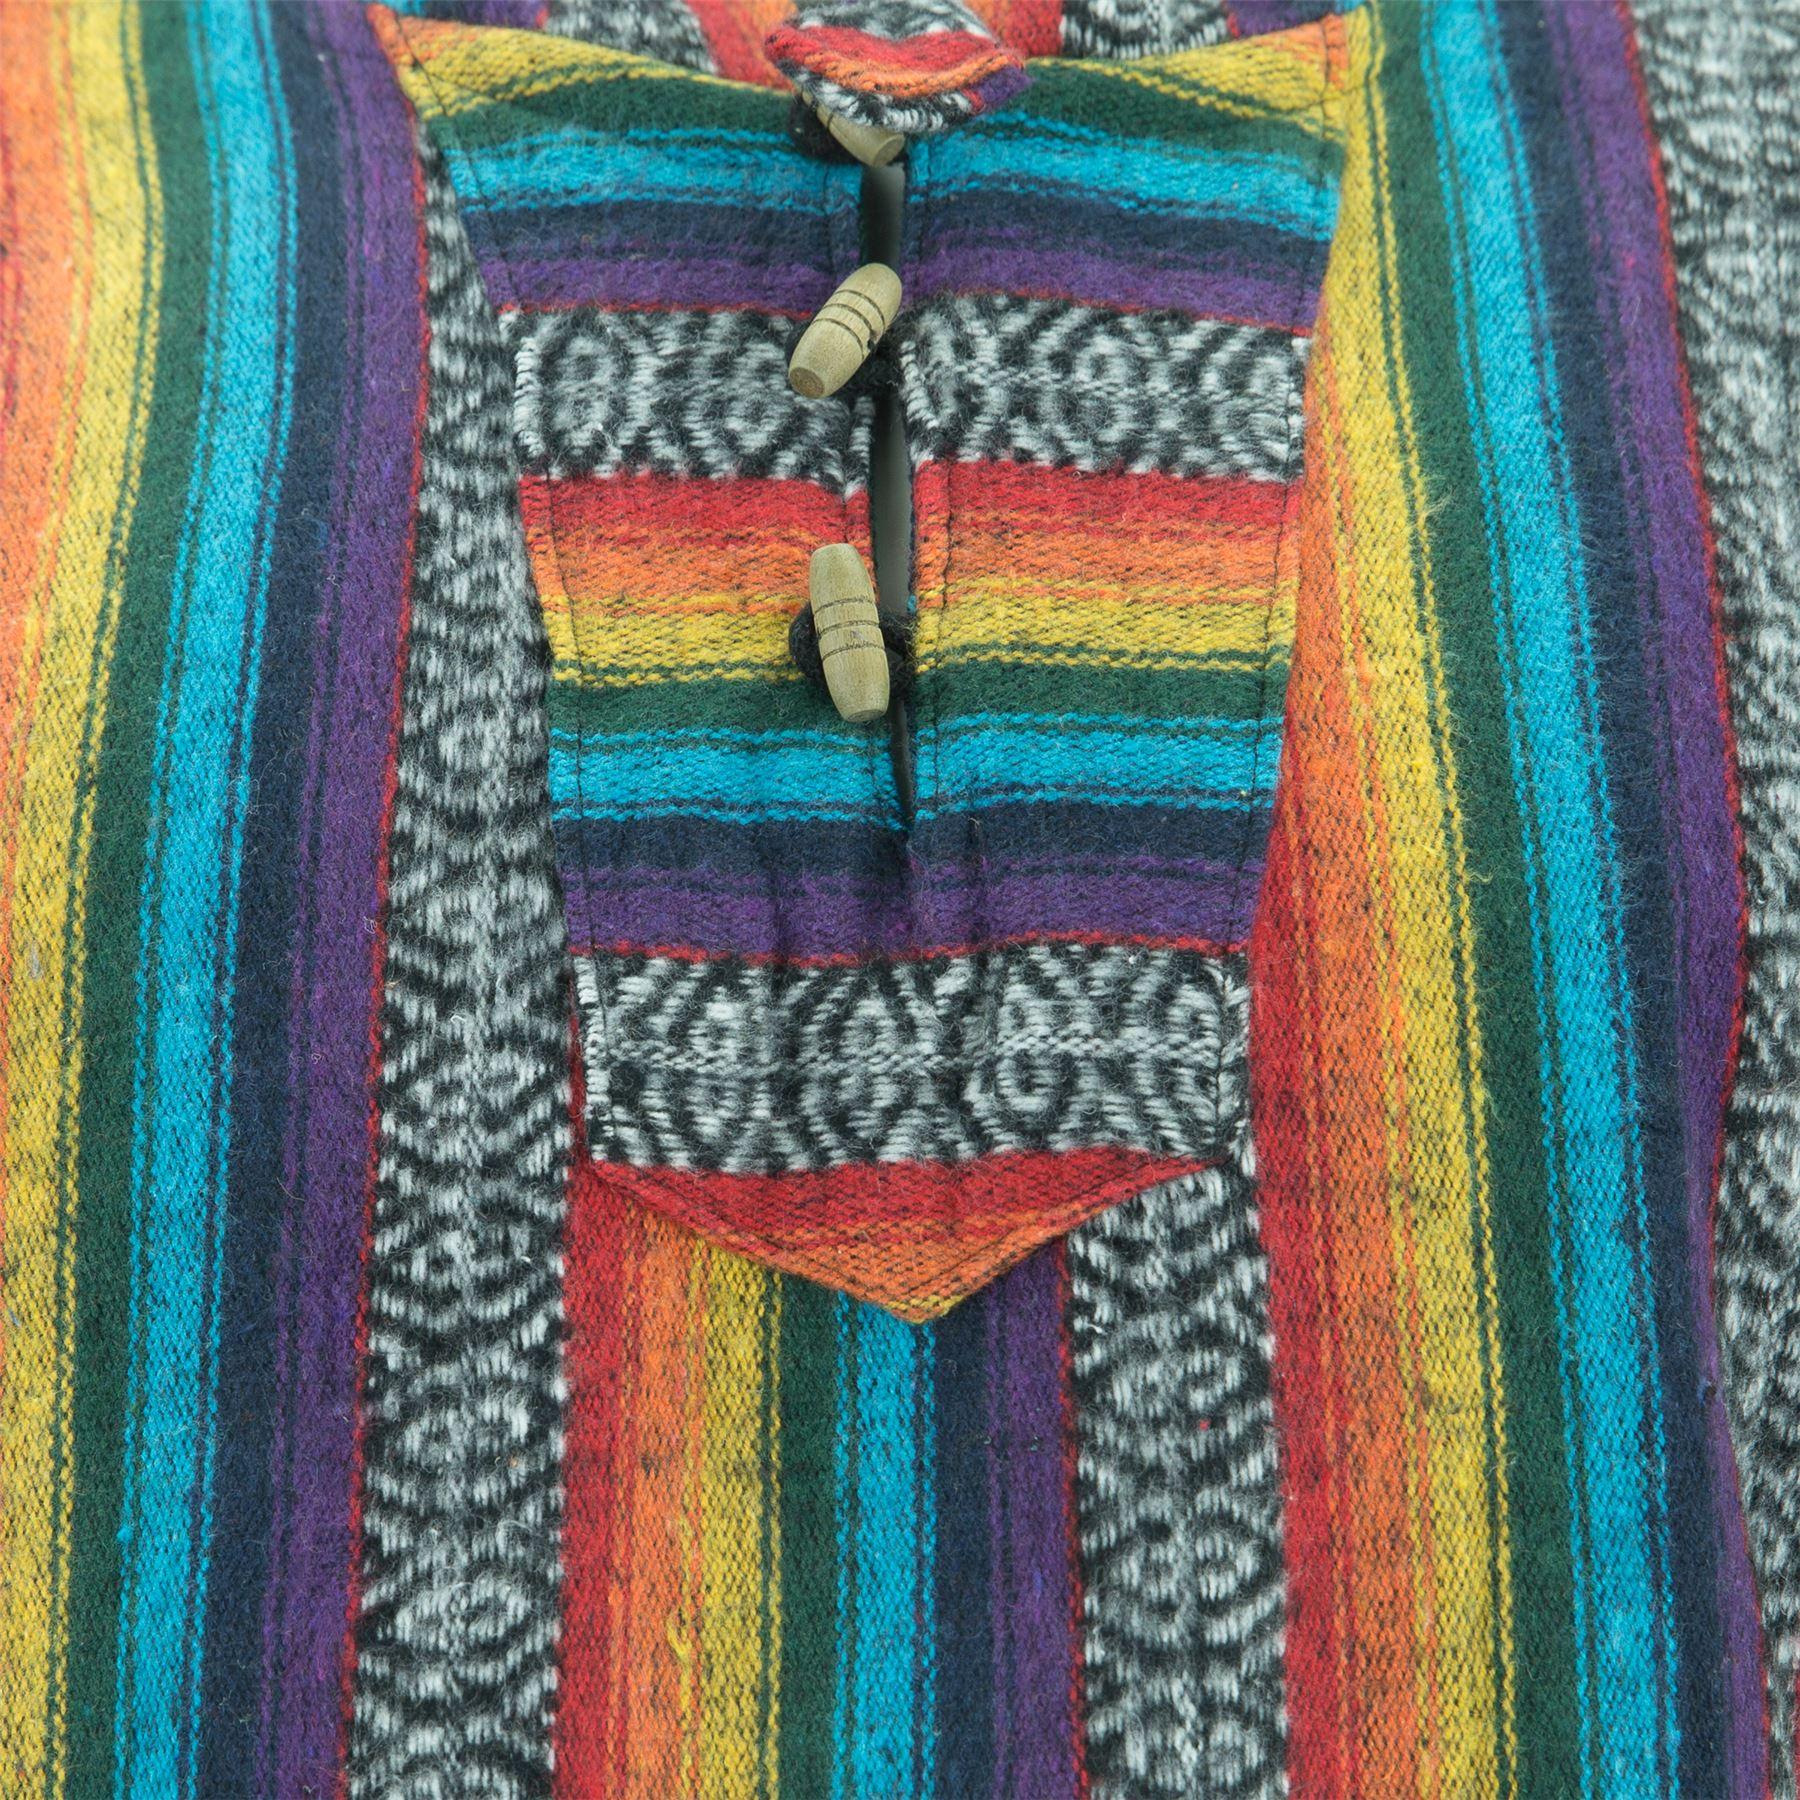 Poncho-Hooded-Cape-Cotton-Warm-Festival-Long-Woven-Rainbow-Men-Women thumbnail 18